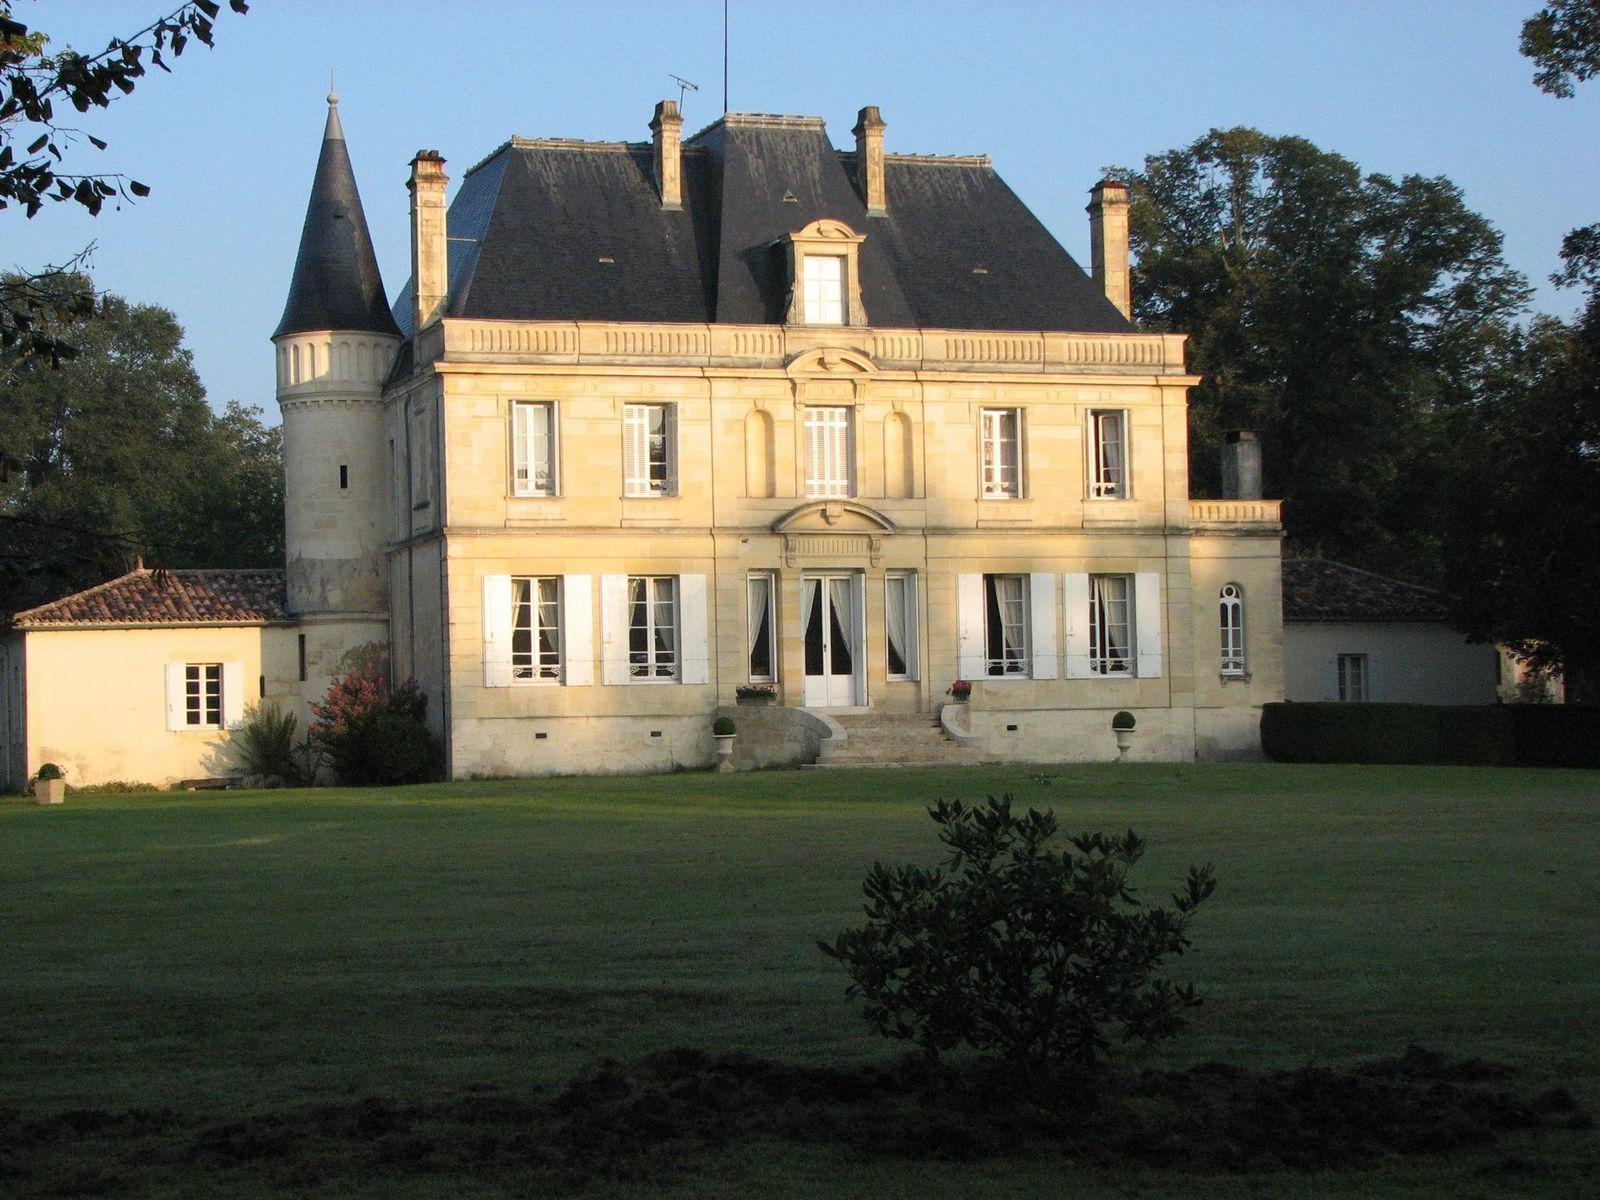 Image : Castelnau-de-médoc